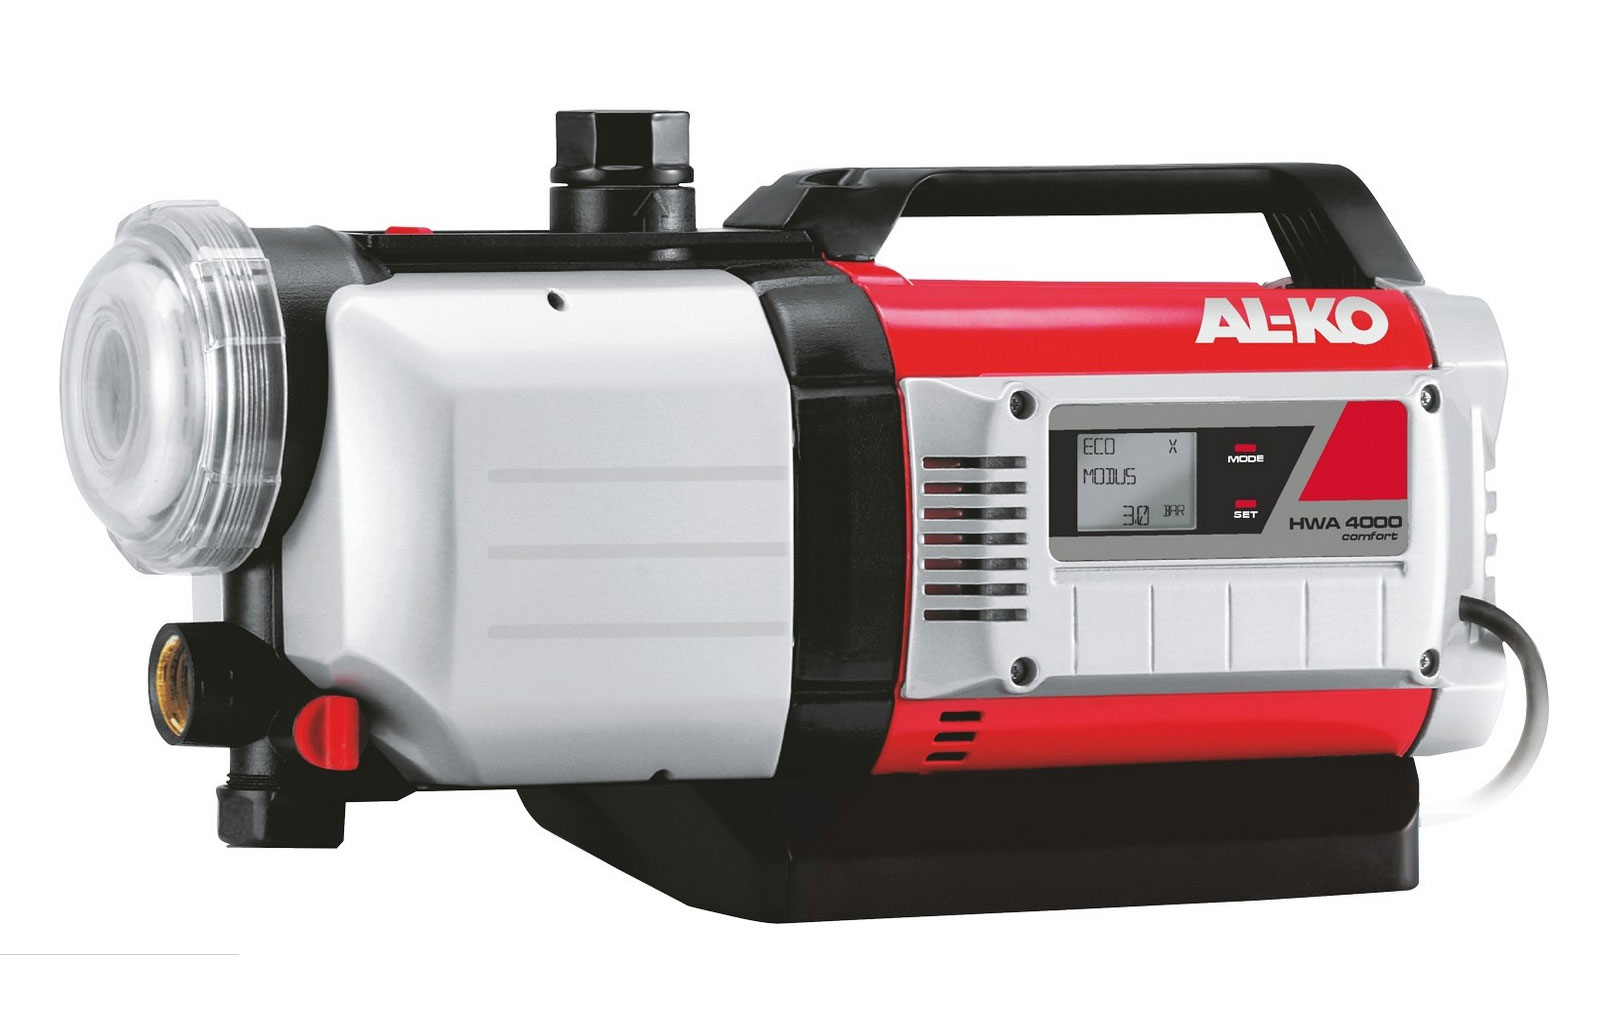 AL-KO Hauswasser-Automat HWA 4000 Comfort 1,0 kW 4000 l/h Bild 1